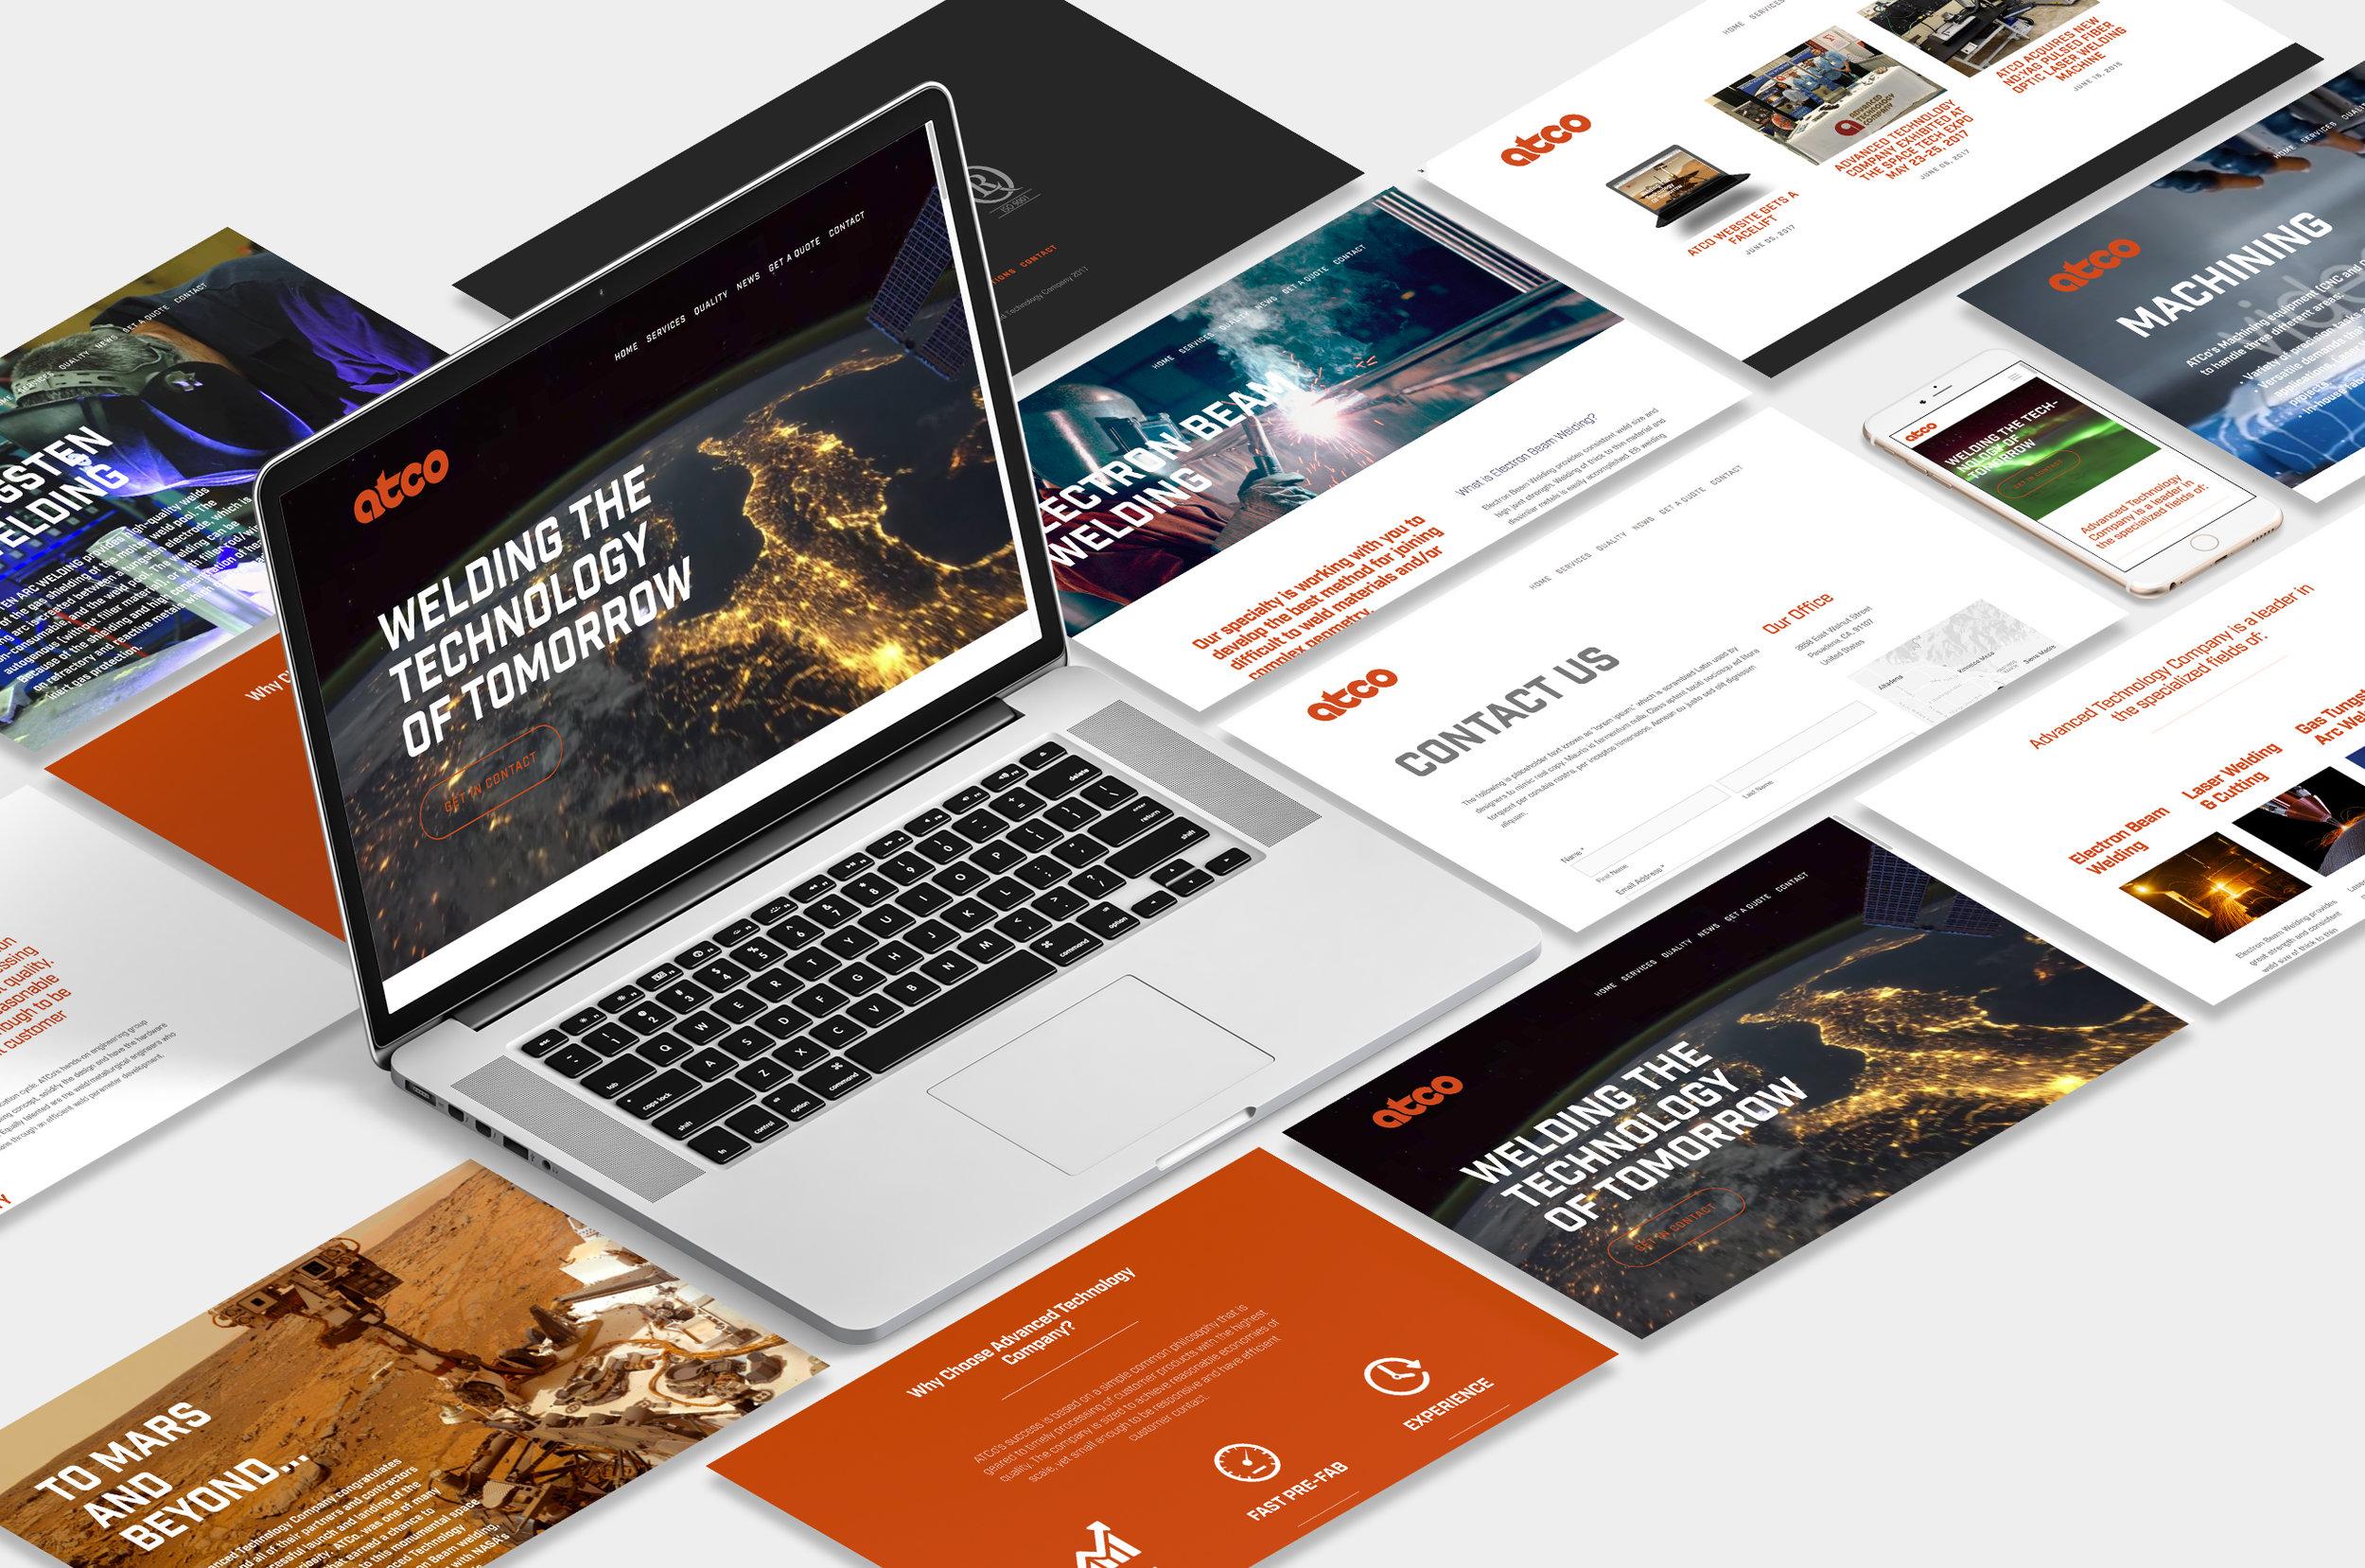 atco website mock up.jpg